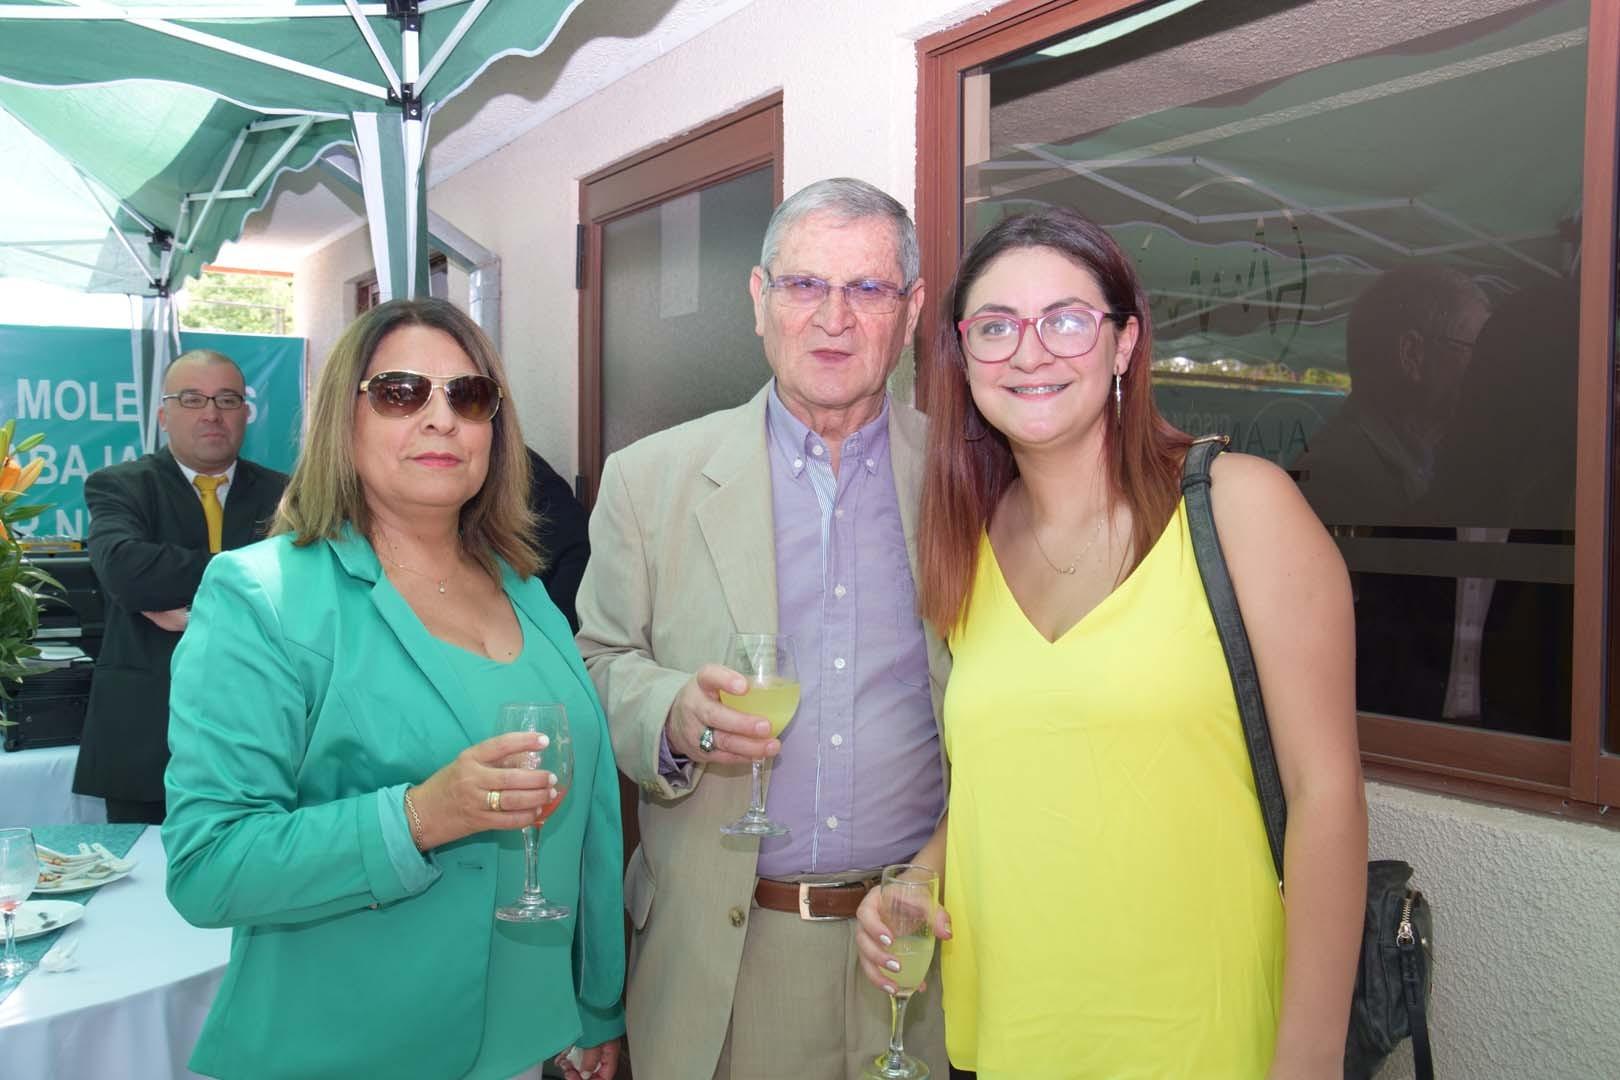 Carmen Fuentes, Víctor Sepúlveda y Camila Sepúlveda